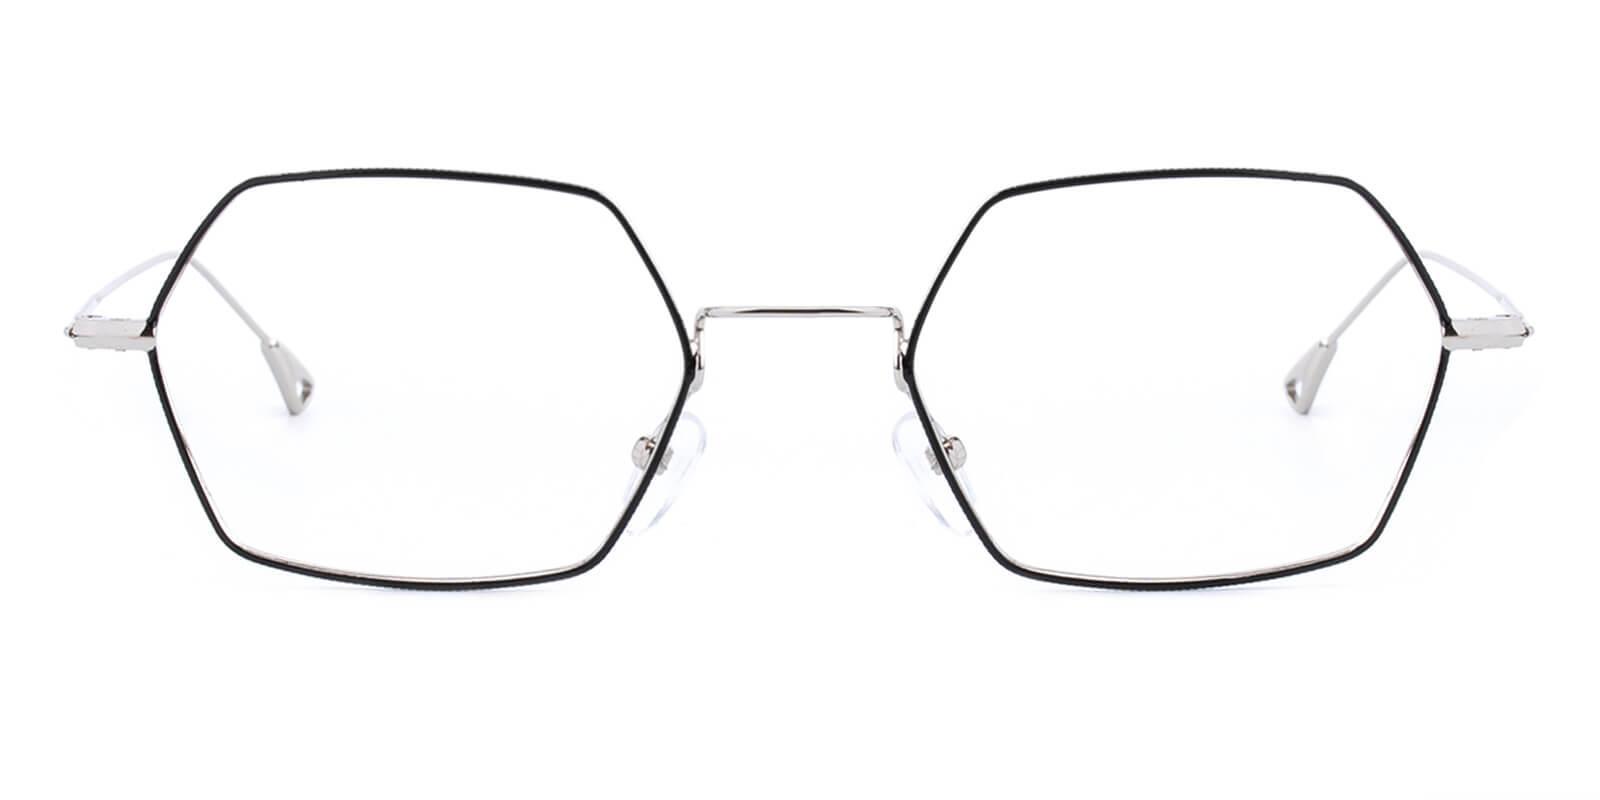 Goldien-Multicolor-Geometric-Metal-Eyeglasses-additional2